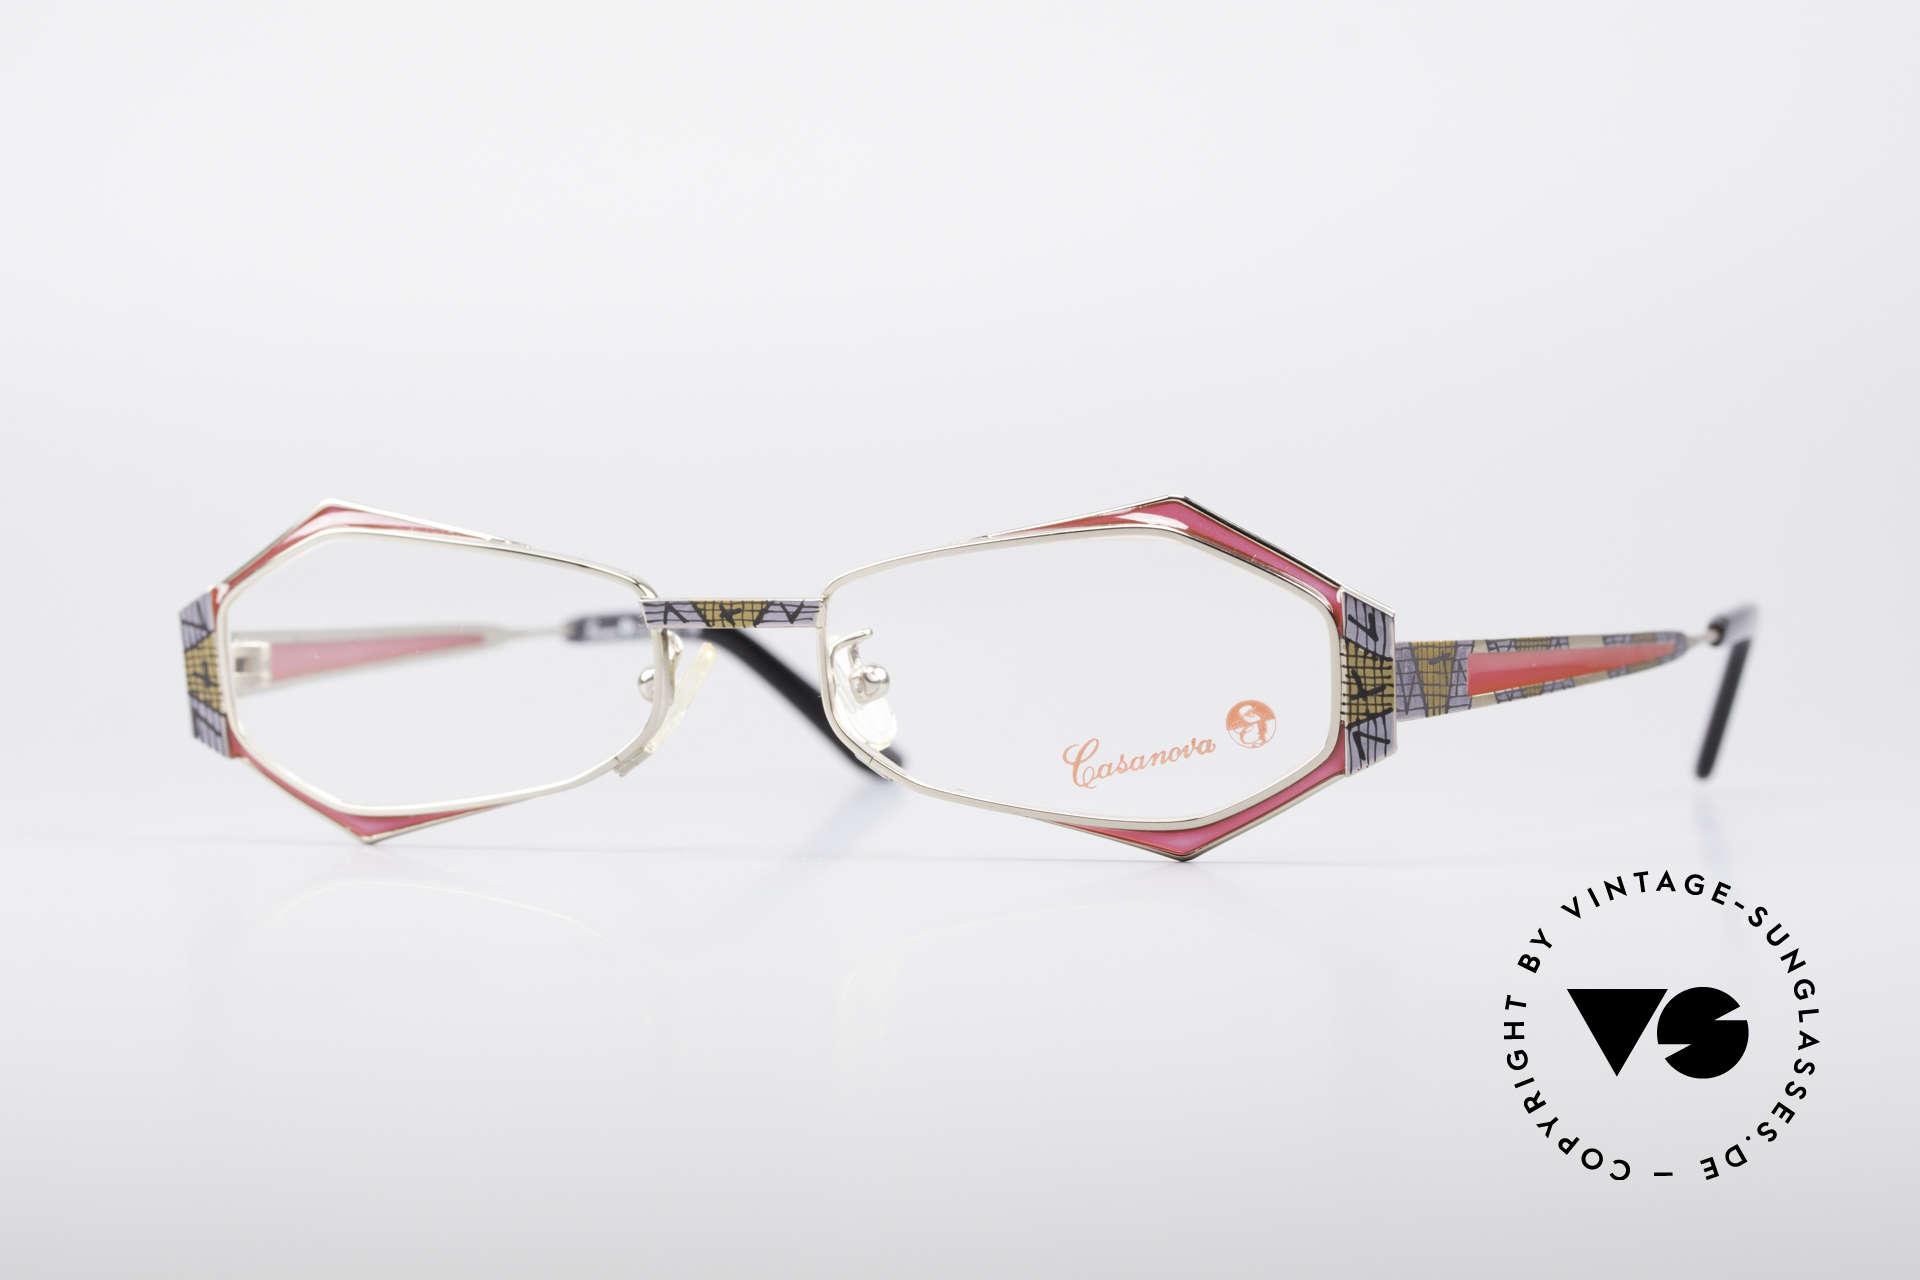 Casanova LC54 Ladies Vintage Frame, eye-catching Casanova vintage glasses of the 1990's, Made for Women